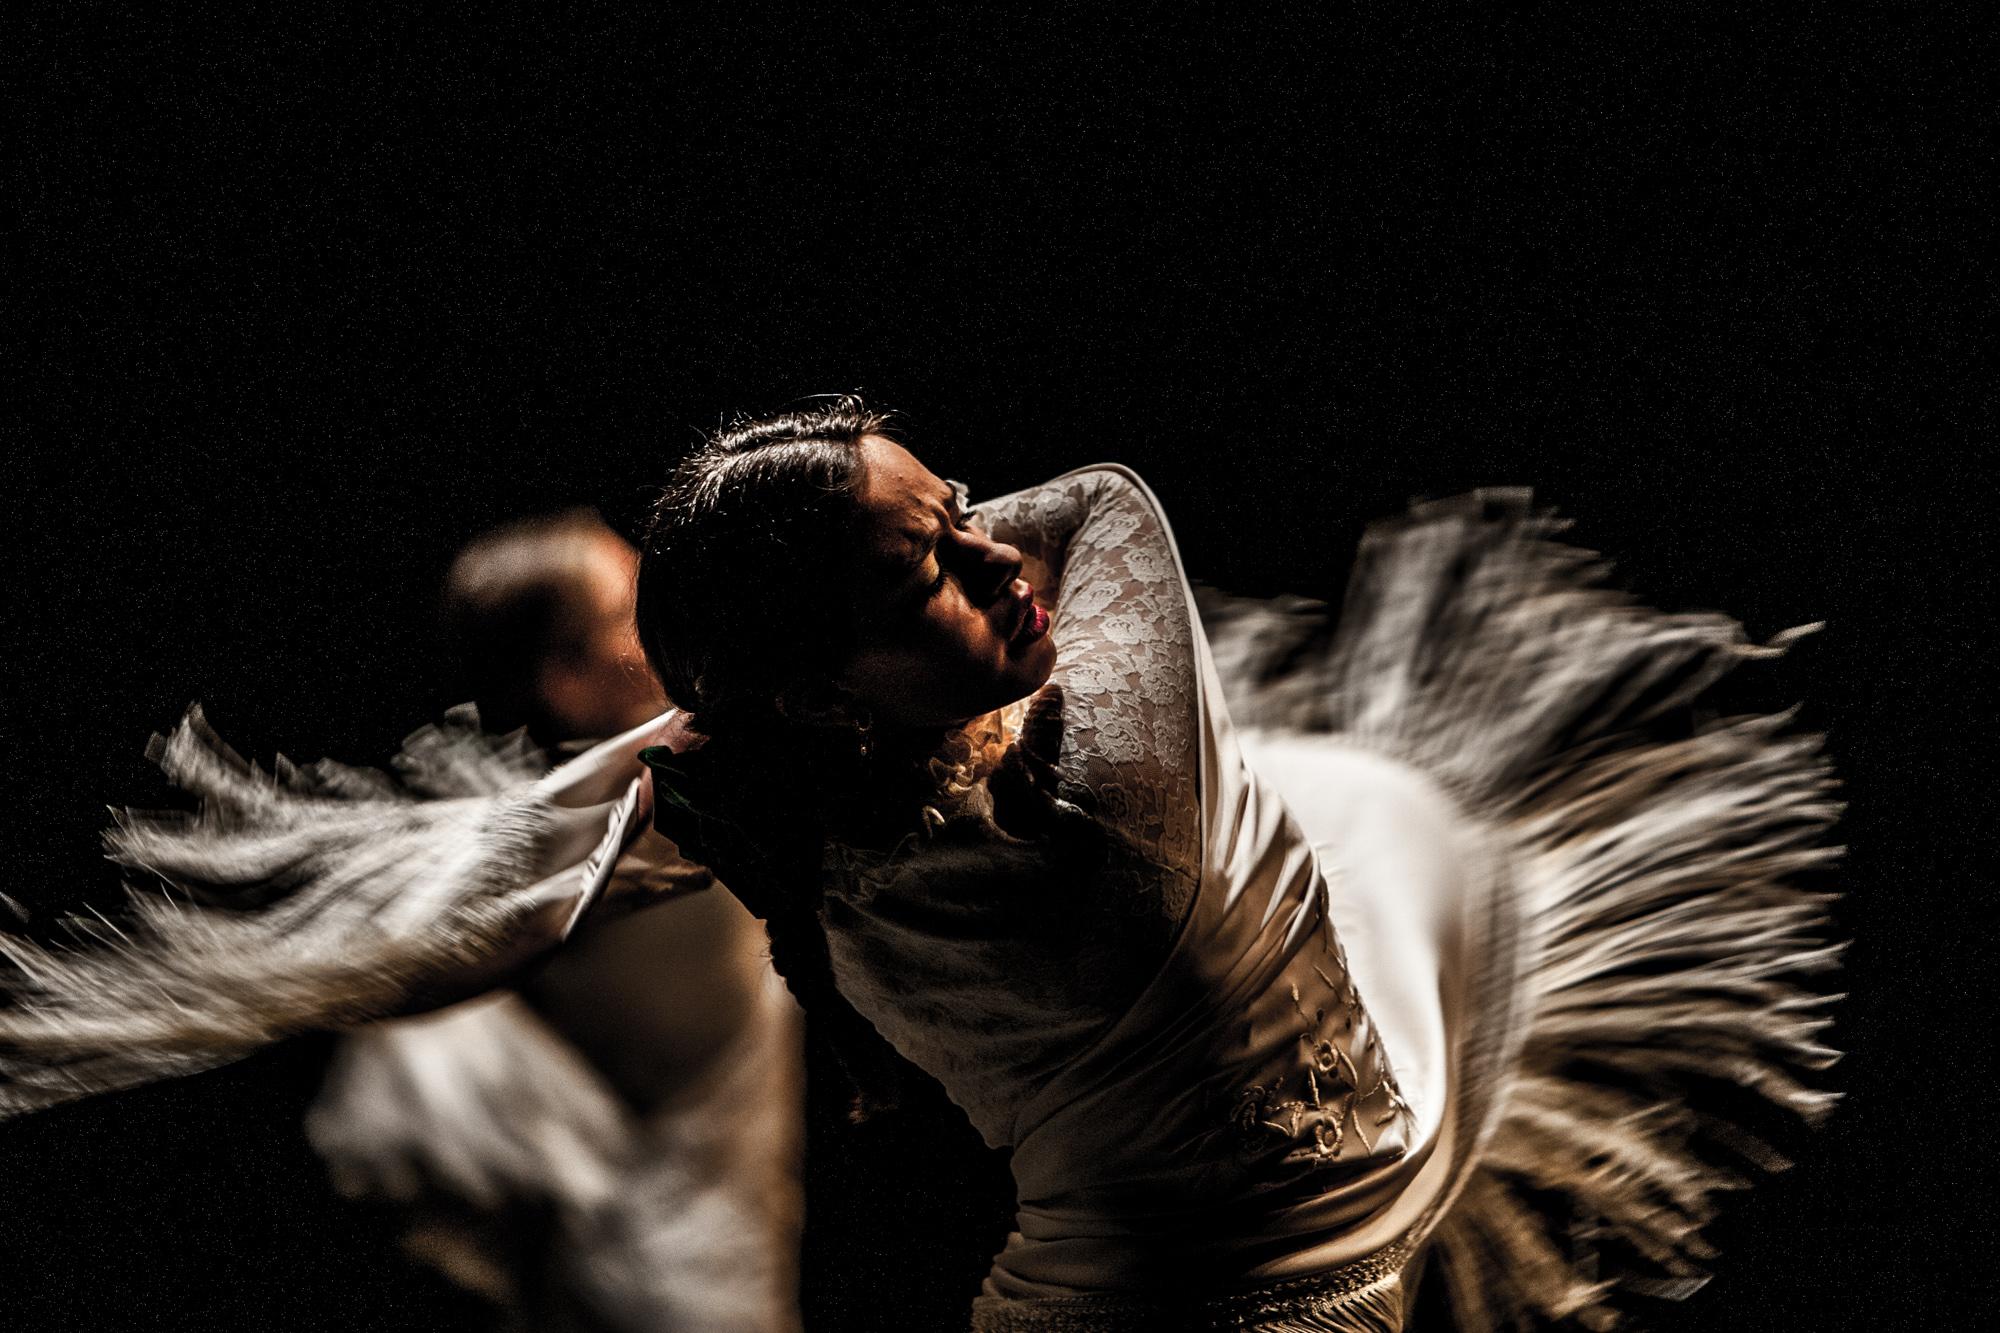 Oto. Teatro López de Ayala. Festival de Danza